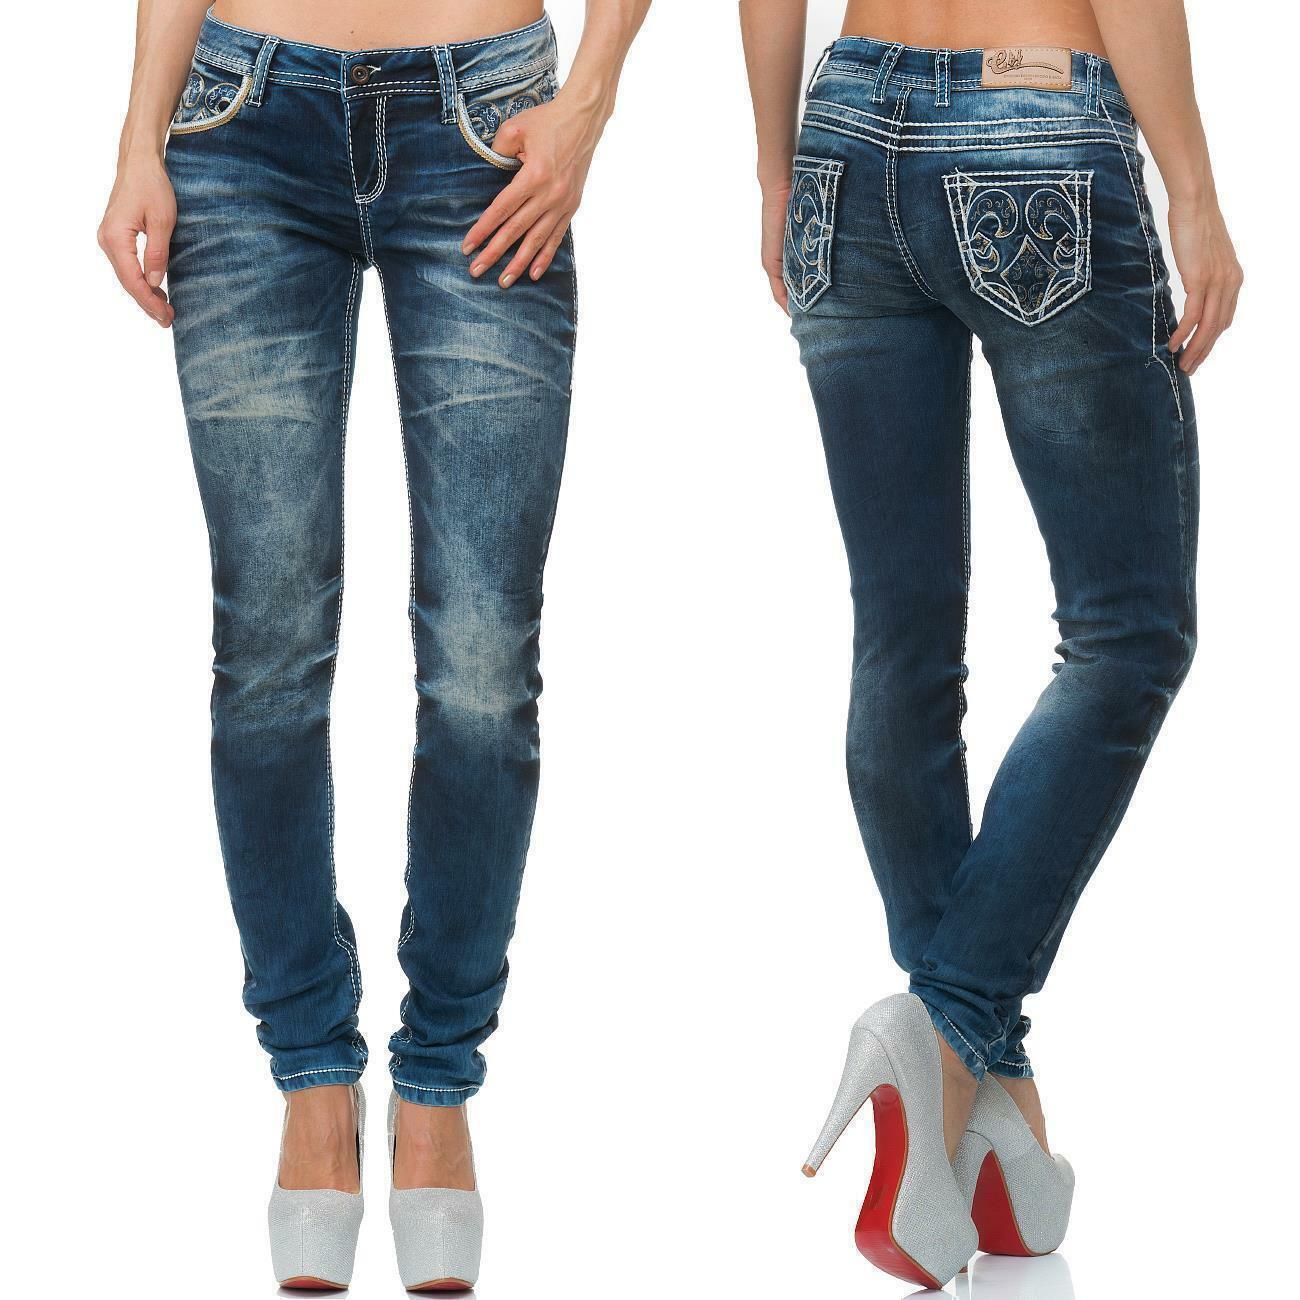 Cipo /& Baxx Damen Regular-Fit Jeans Freizeit Hose Casual Style Denim bequem